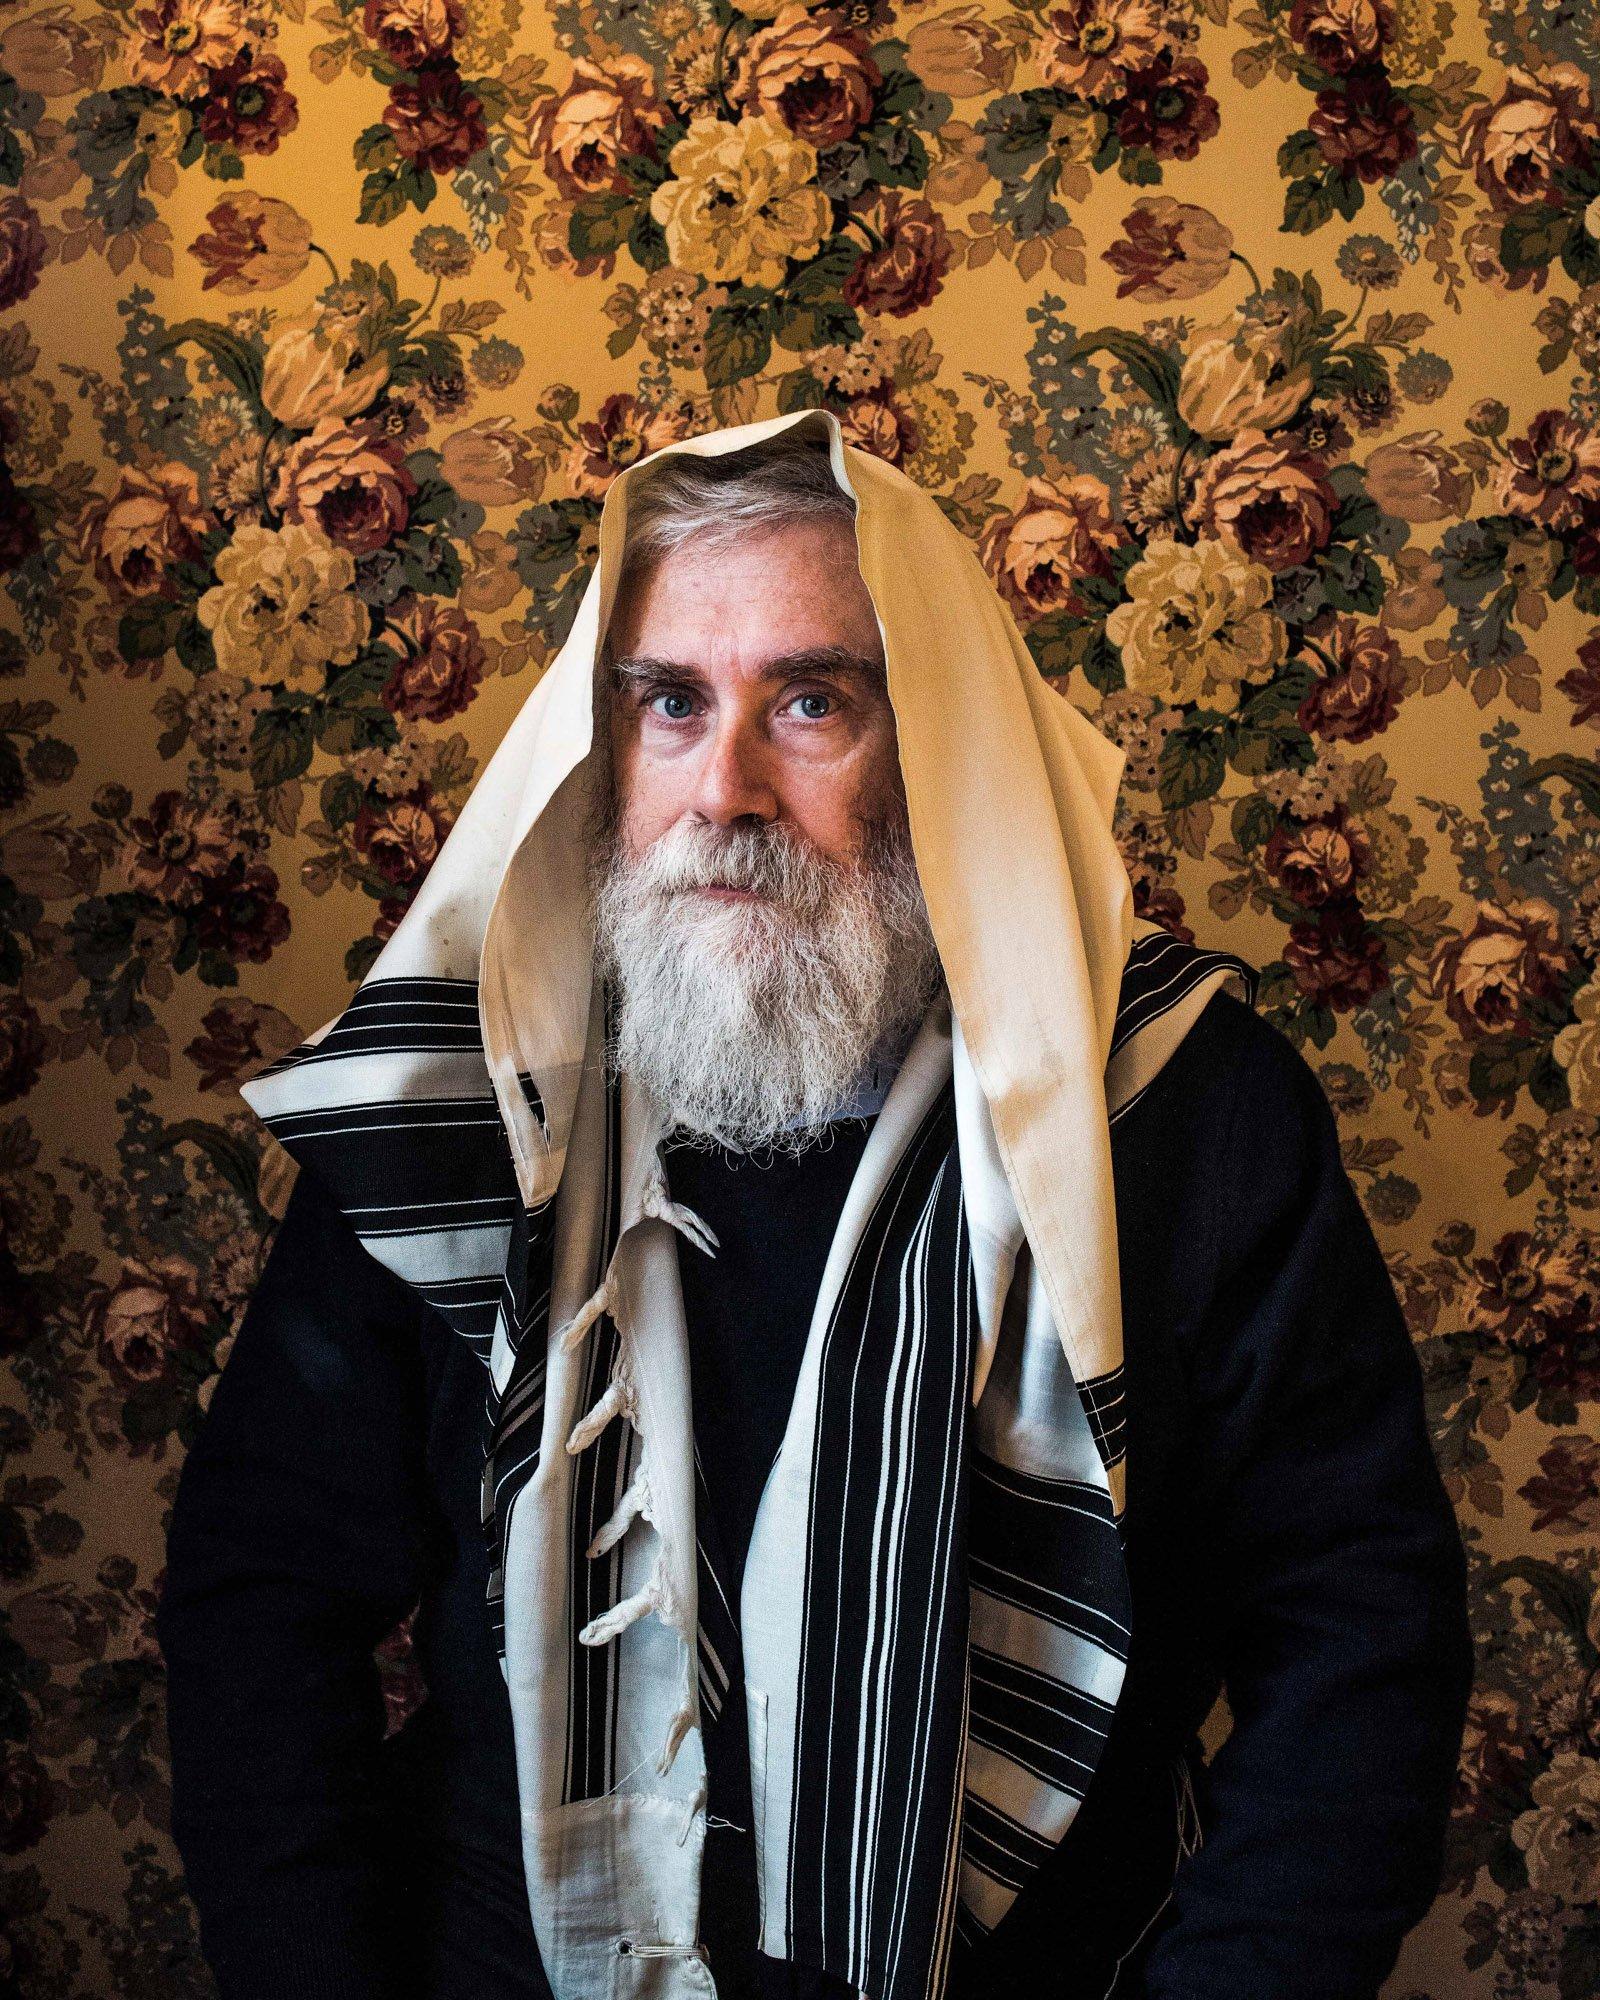 Portrait photograph of a old man boy by Kovi Konowiecki